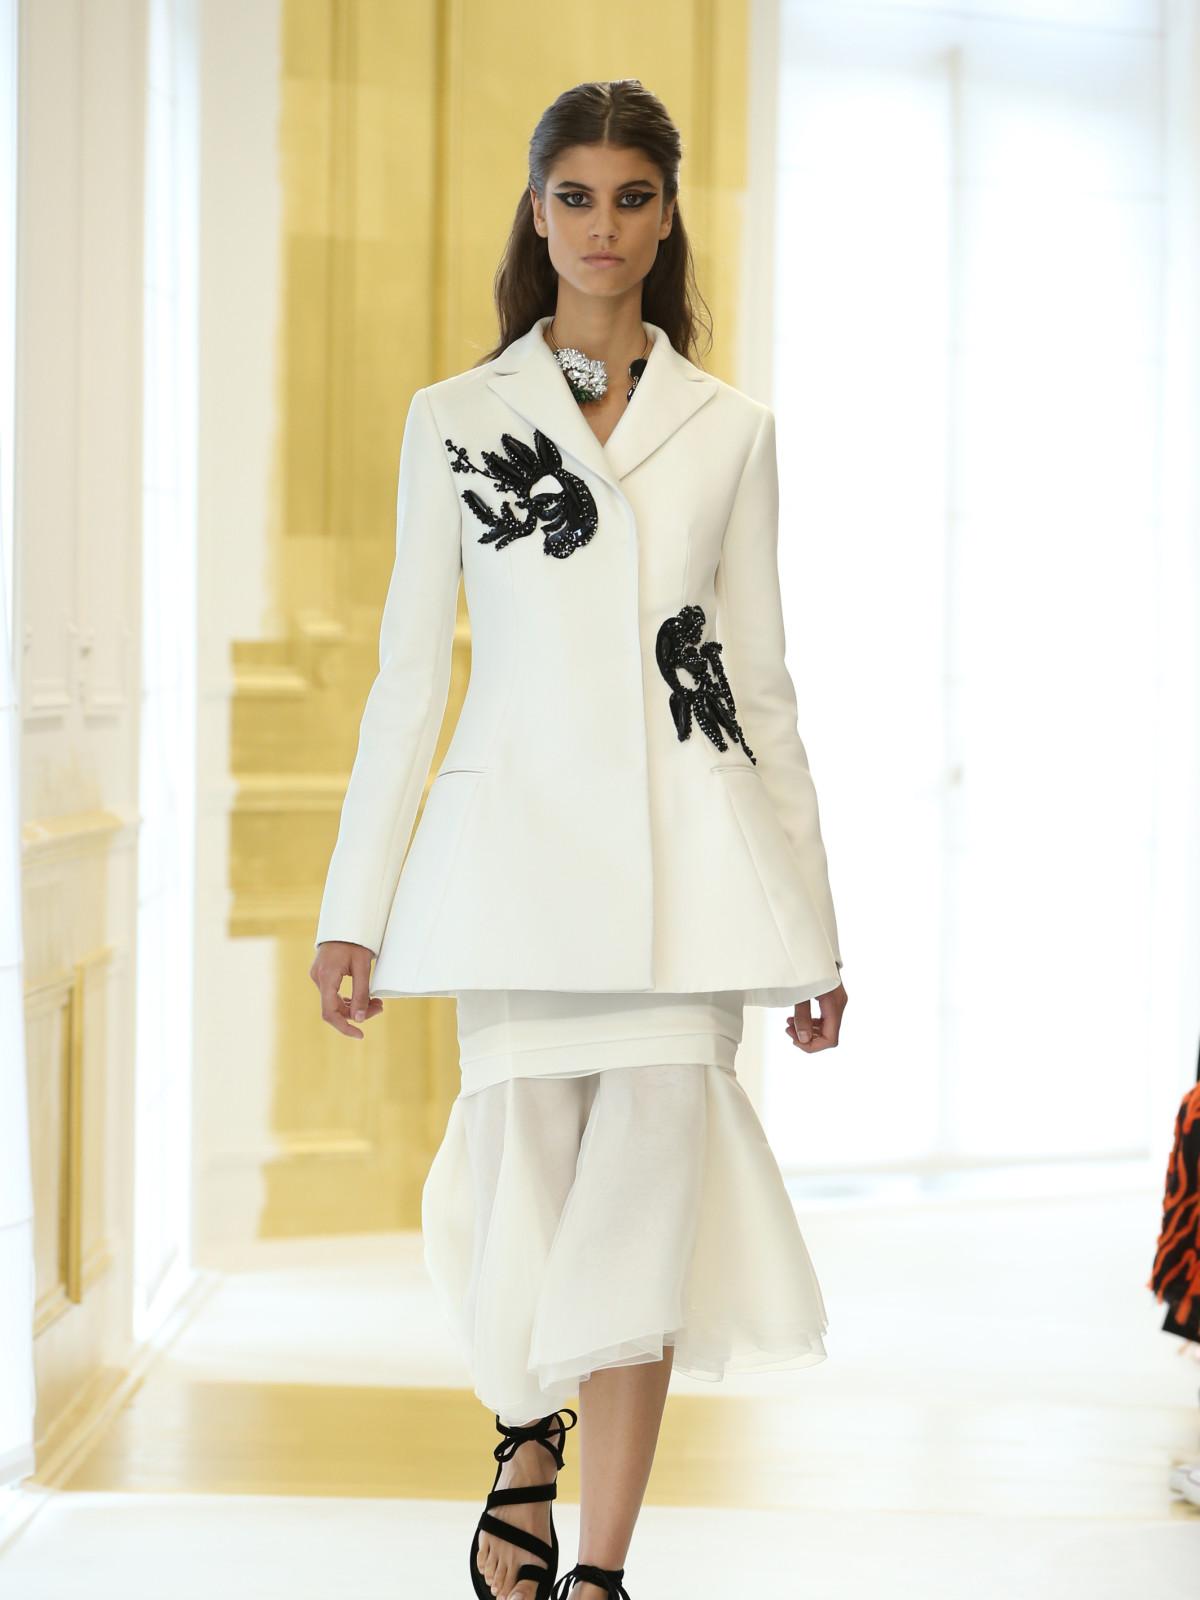 Dior haute couture runway show Paris finale look 12